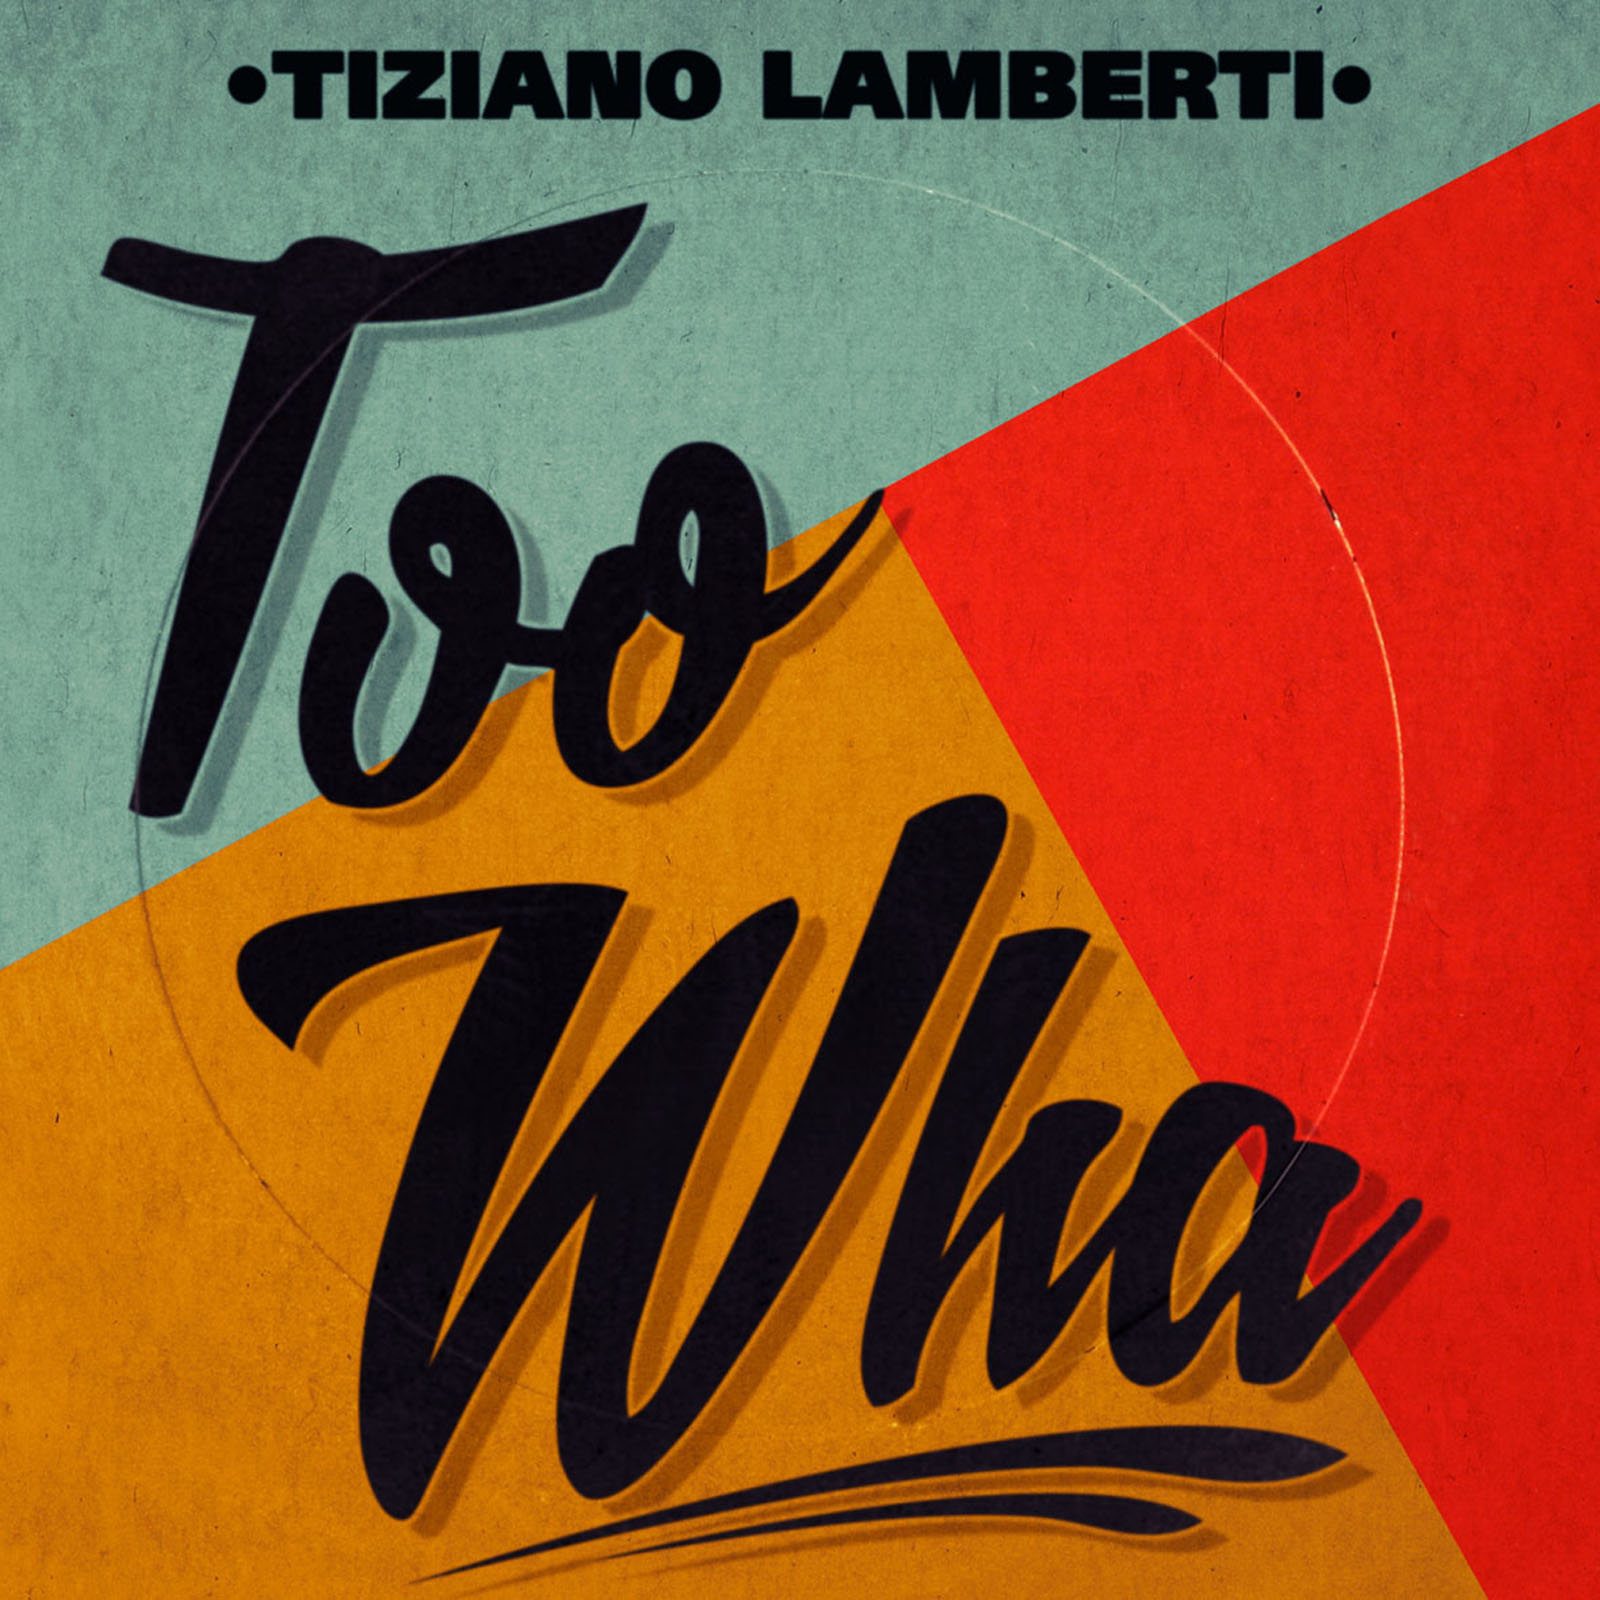 Tiziano Lamberti – Too Wha